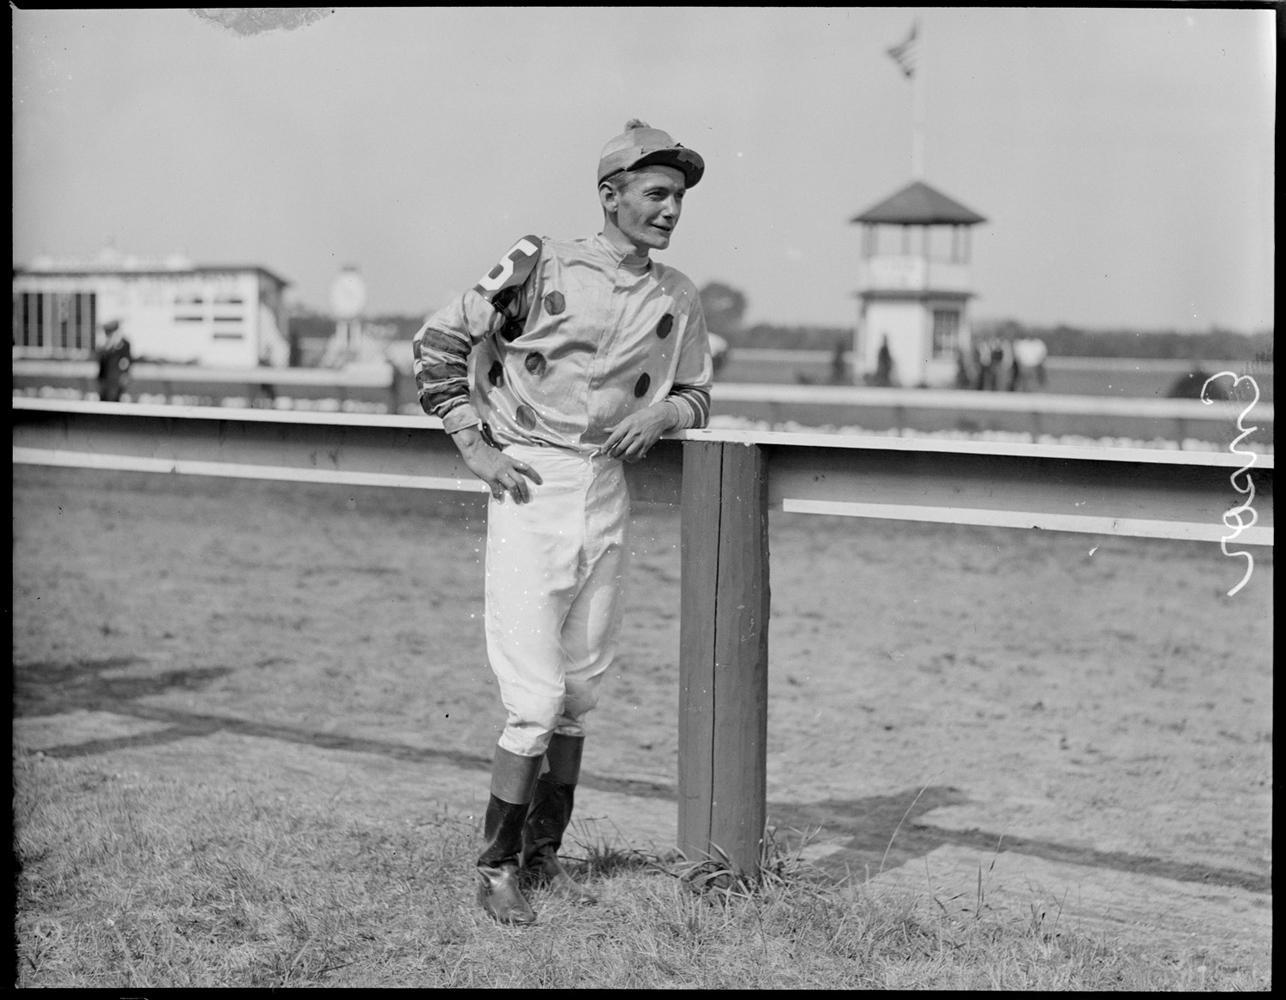 Jockey Buddy Ensor at Rockingham, 1933 (Courtesy of the Boston Public Library, Leslie Jones Collection)